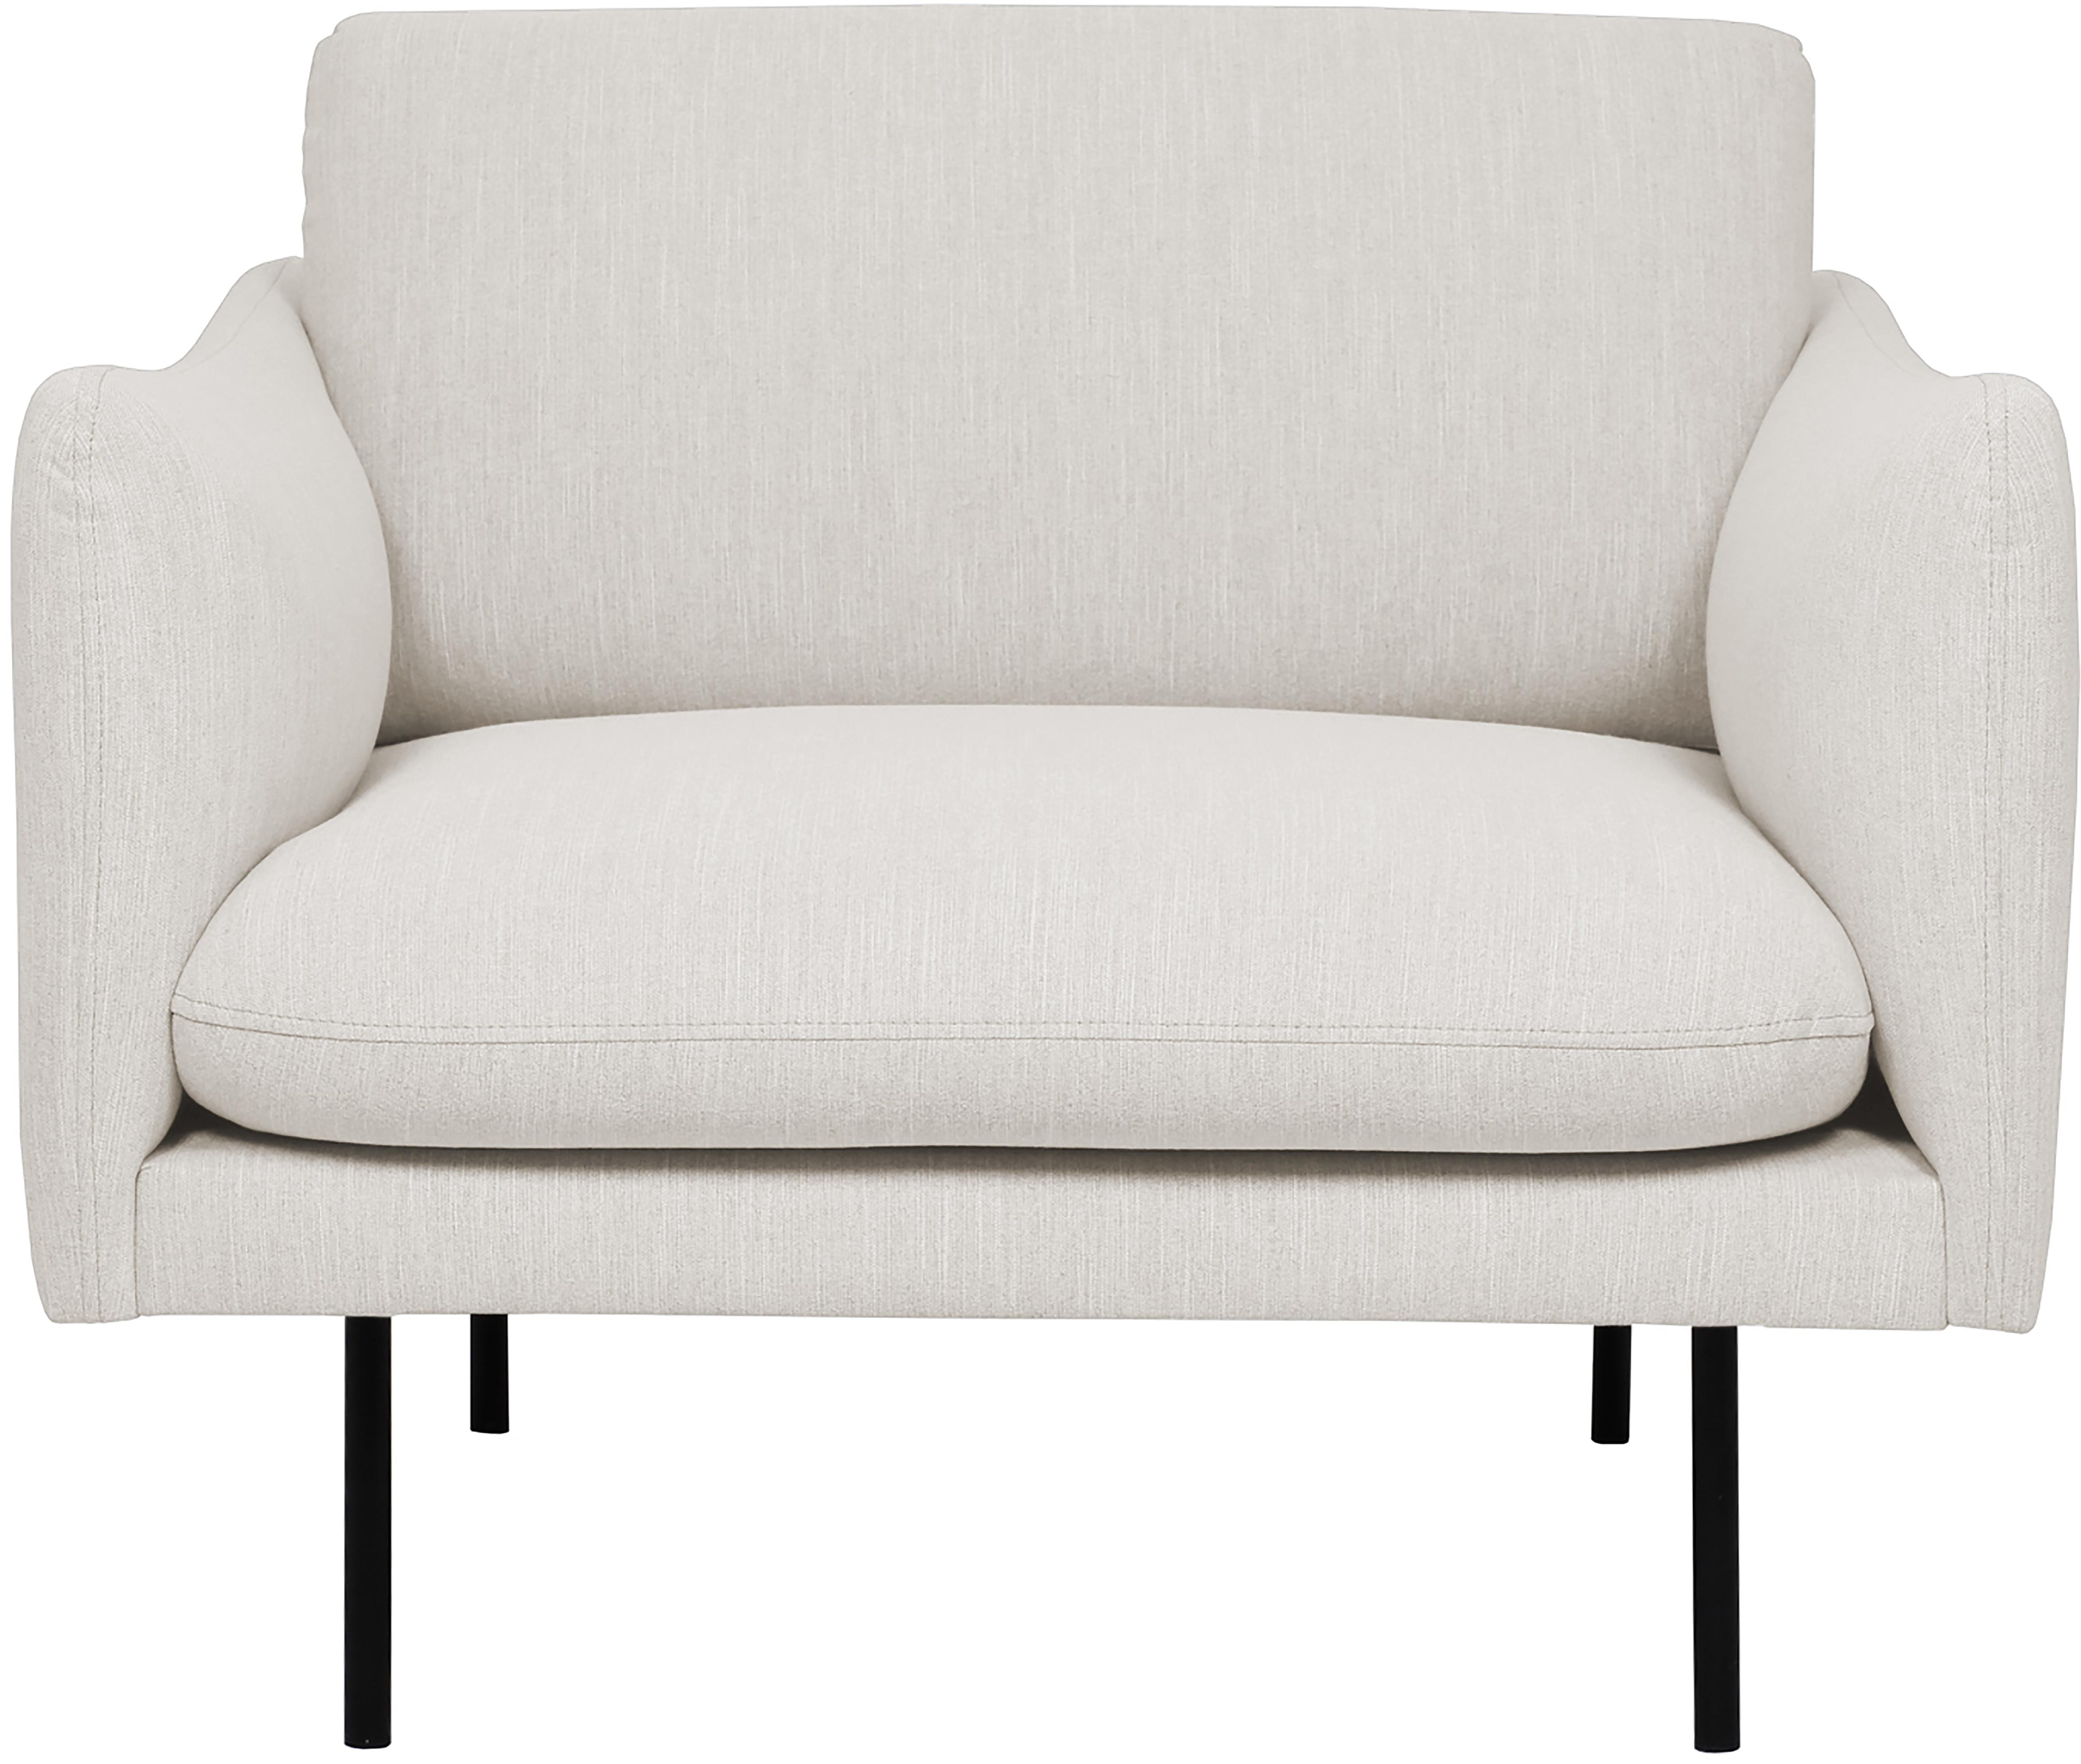 Sessel Moby, Bezug: Polyester Der hochwertige, Gestell: Massives Kiefernholz, Füße: Metall, pulverbeschichtet, Webstoff Beige, B 90 x T 90 cm